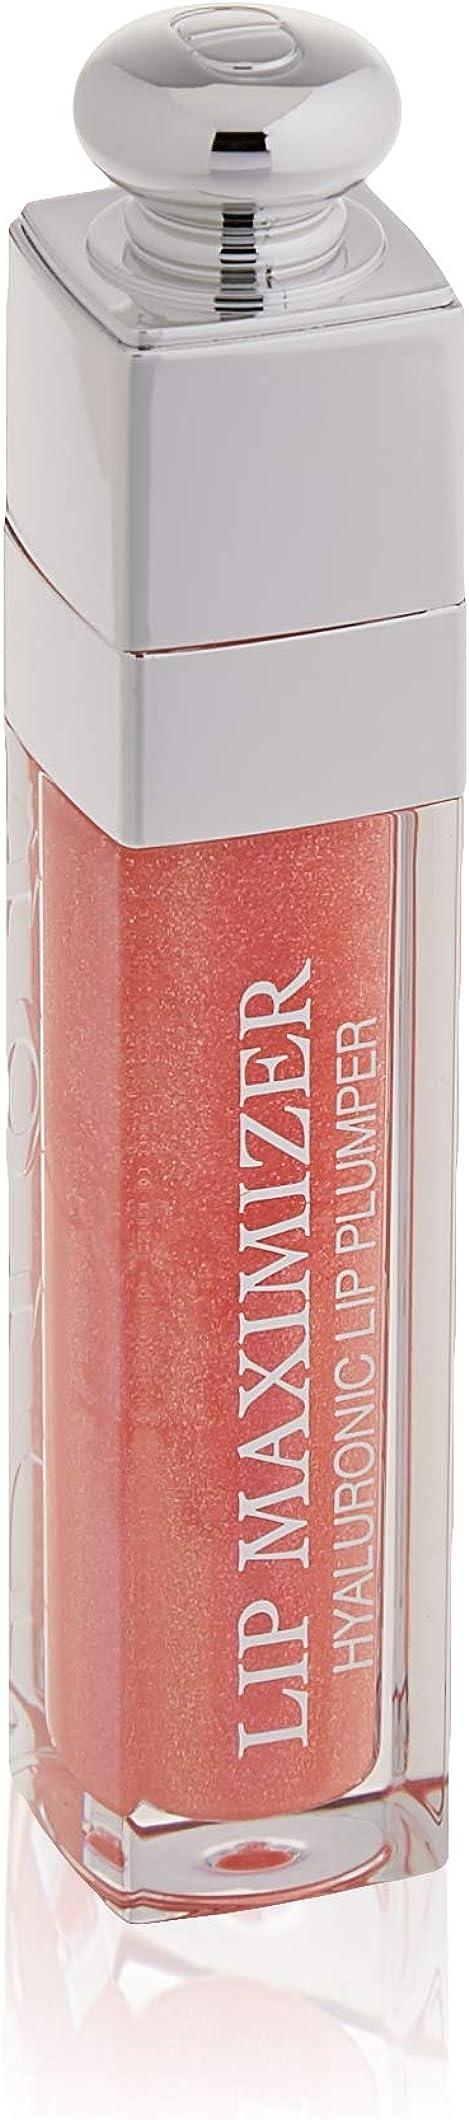 Lucidalabbra christian dior addict maximizer barra de labios 010 holo pink - 7 ml 3348900000000